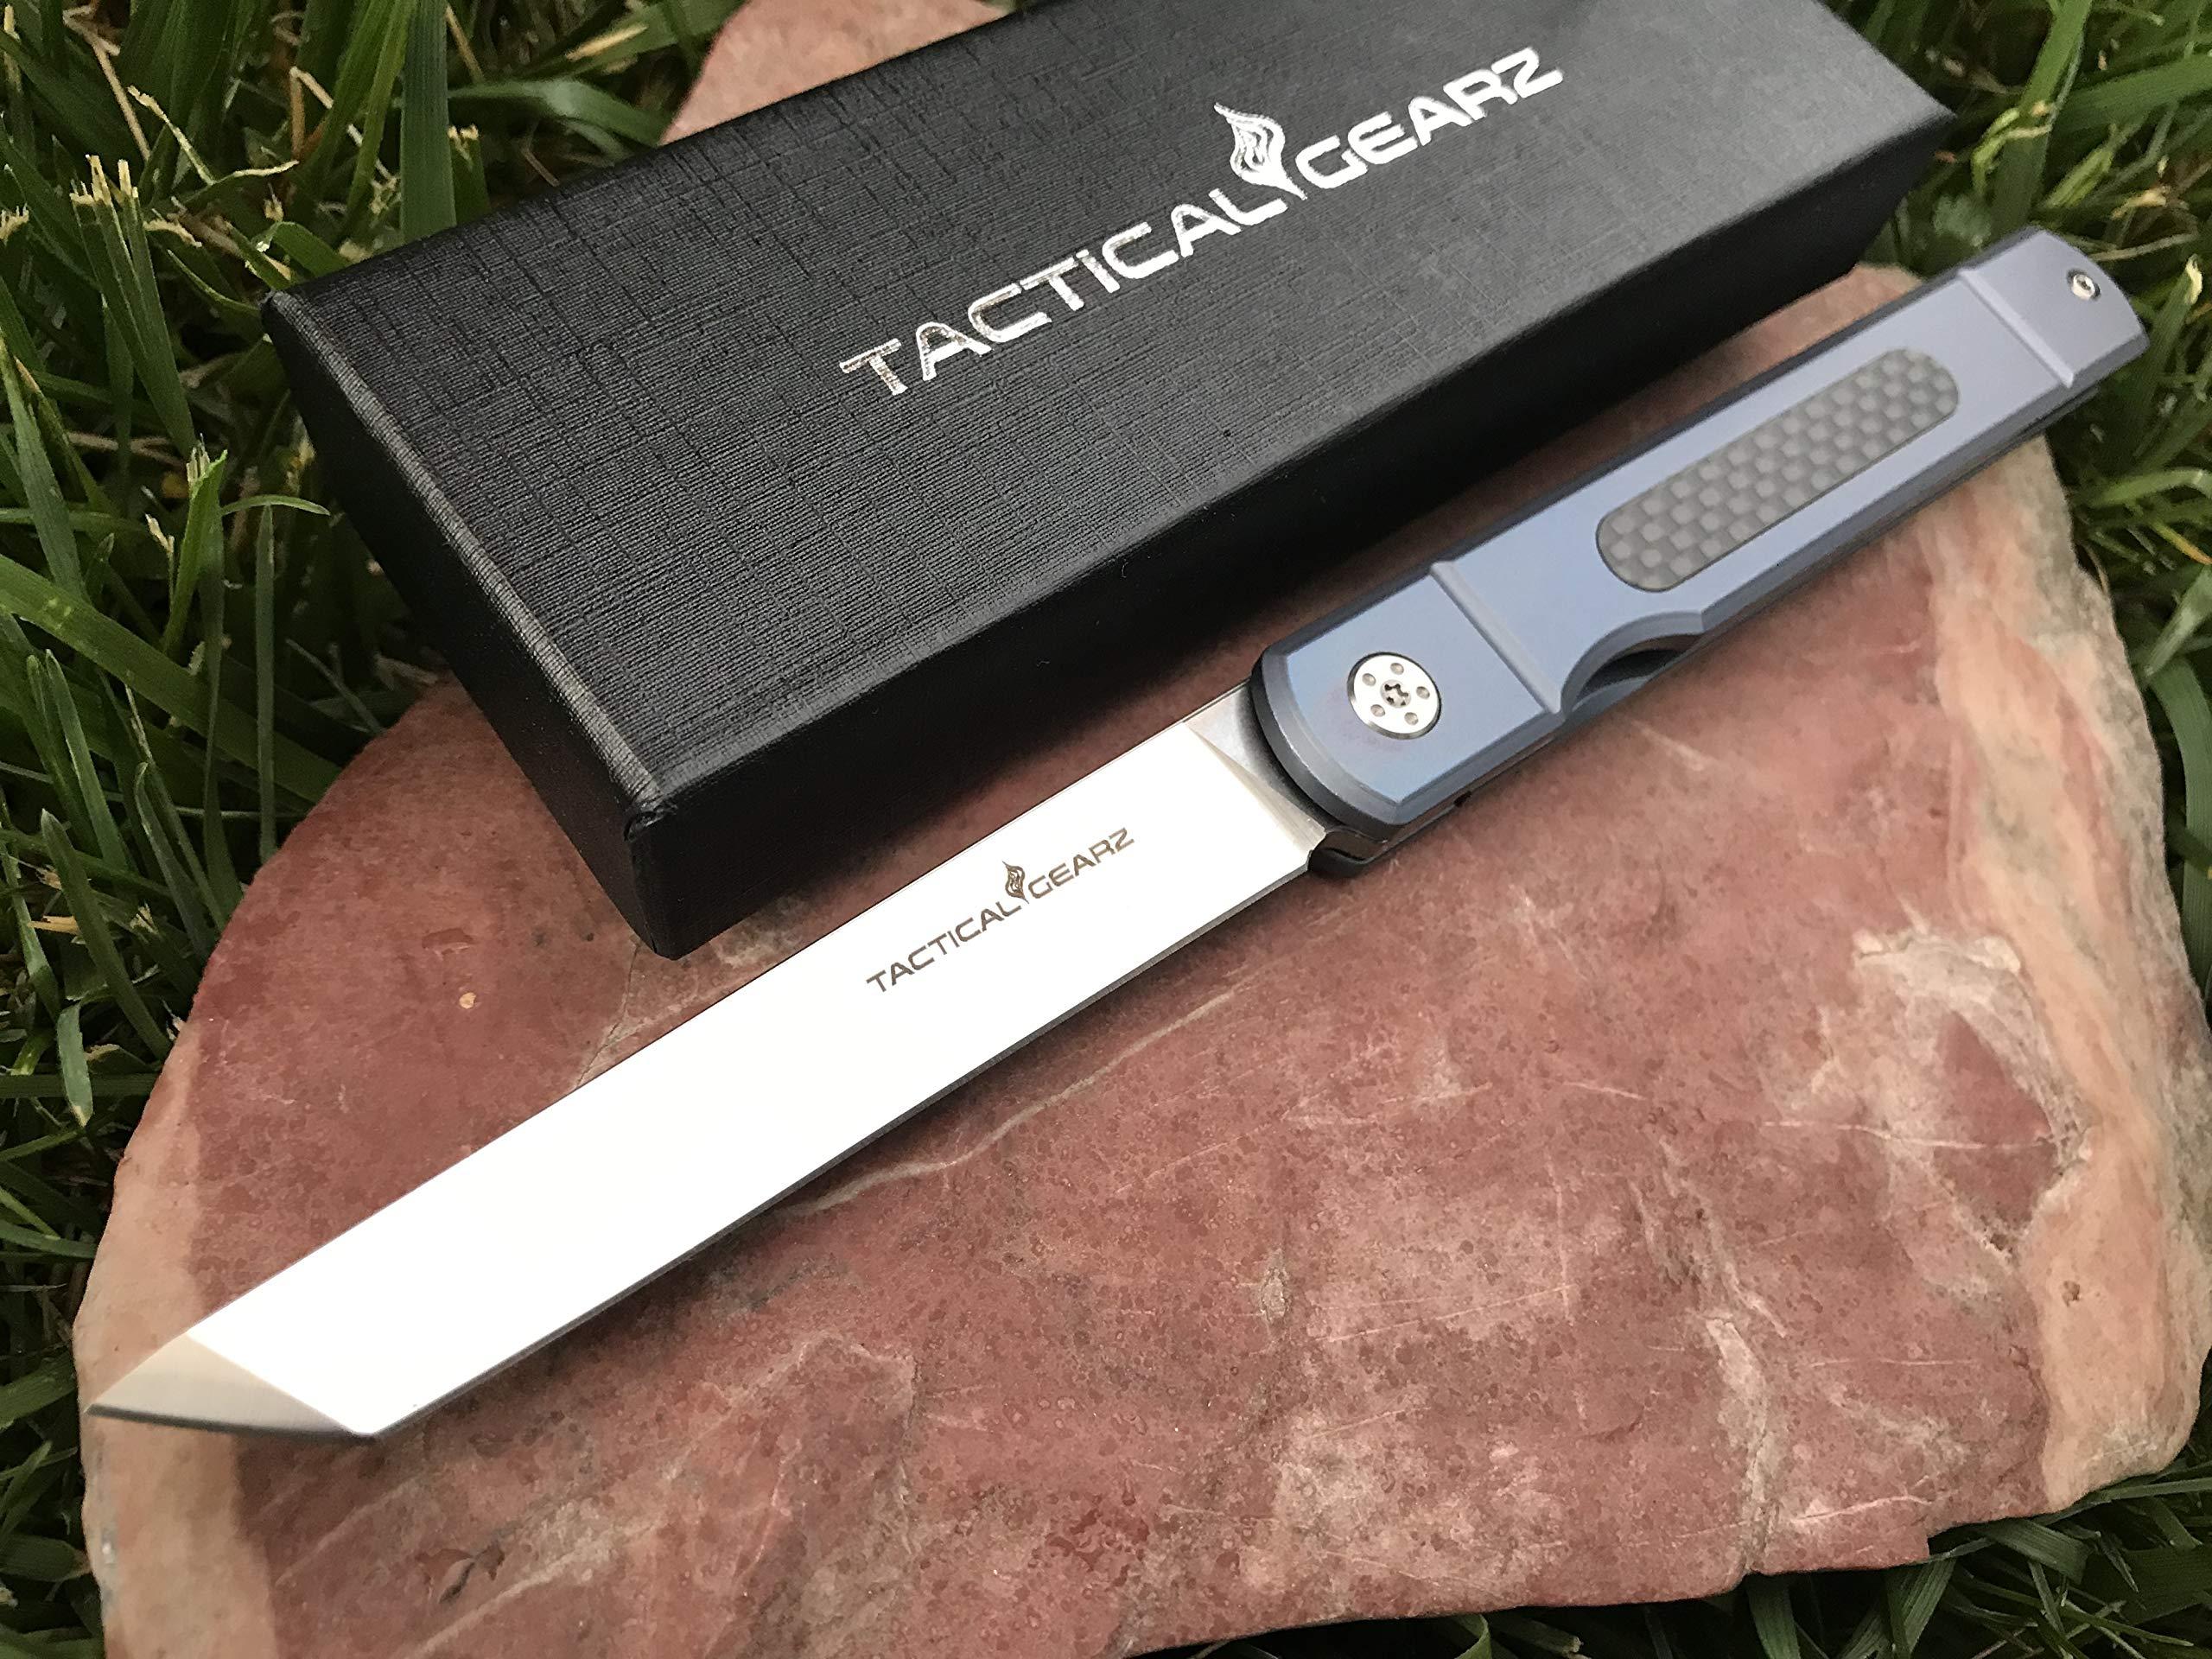 TG Tatsu, Tc4 Titanium/Carbon Fiber Japanese Style EDC Folding Knife w/Sheath! Polished D2 Steel Tanto Blade! Ball Bearing Pivot System! (Blue Pearl) by TacticalGearz